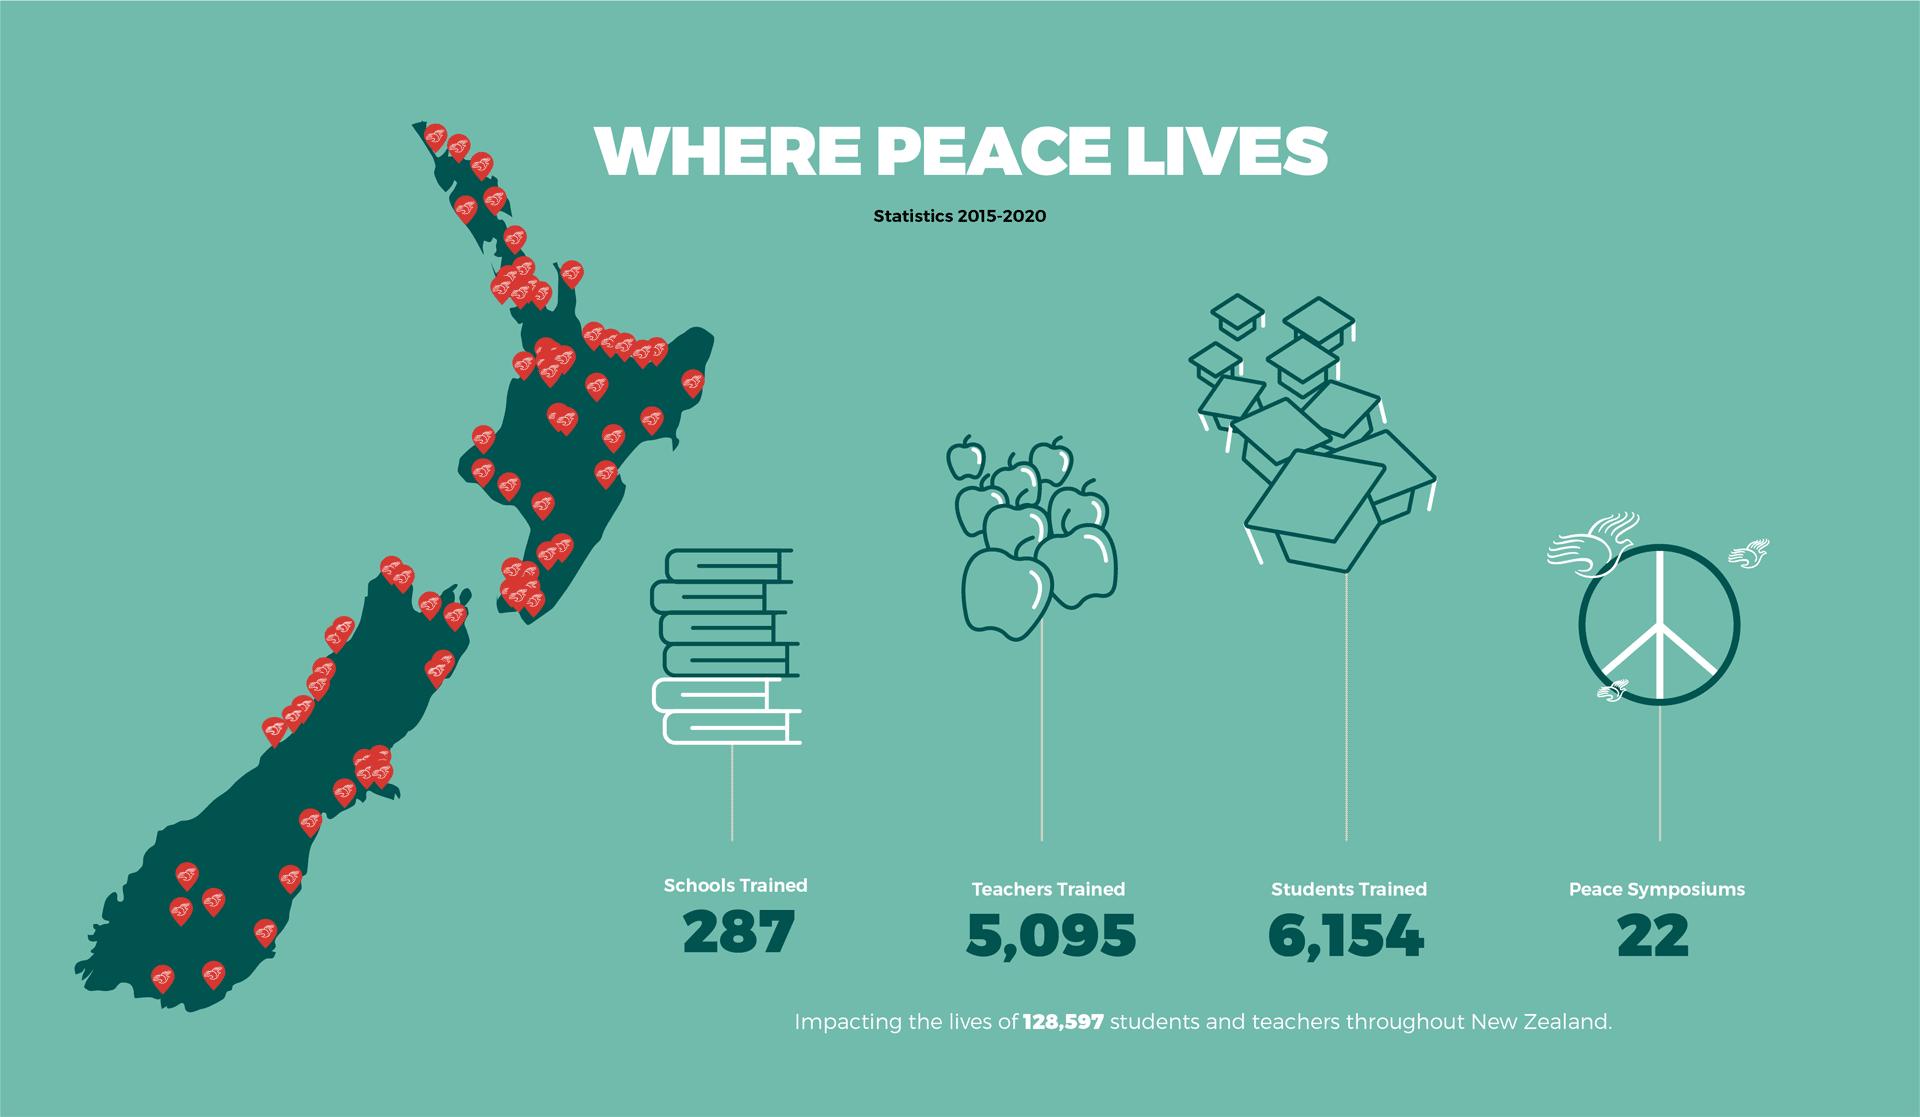 Where Peace Lives